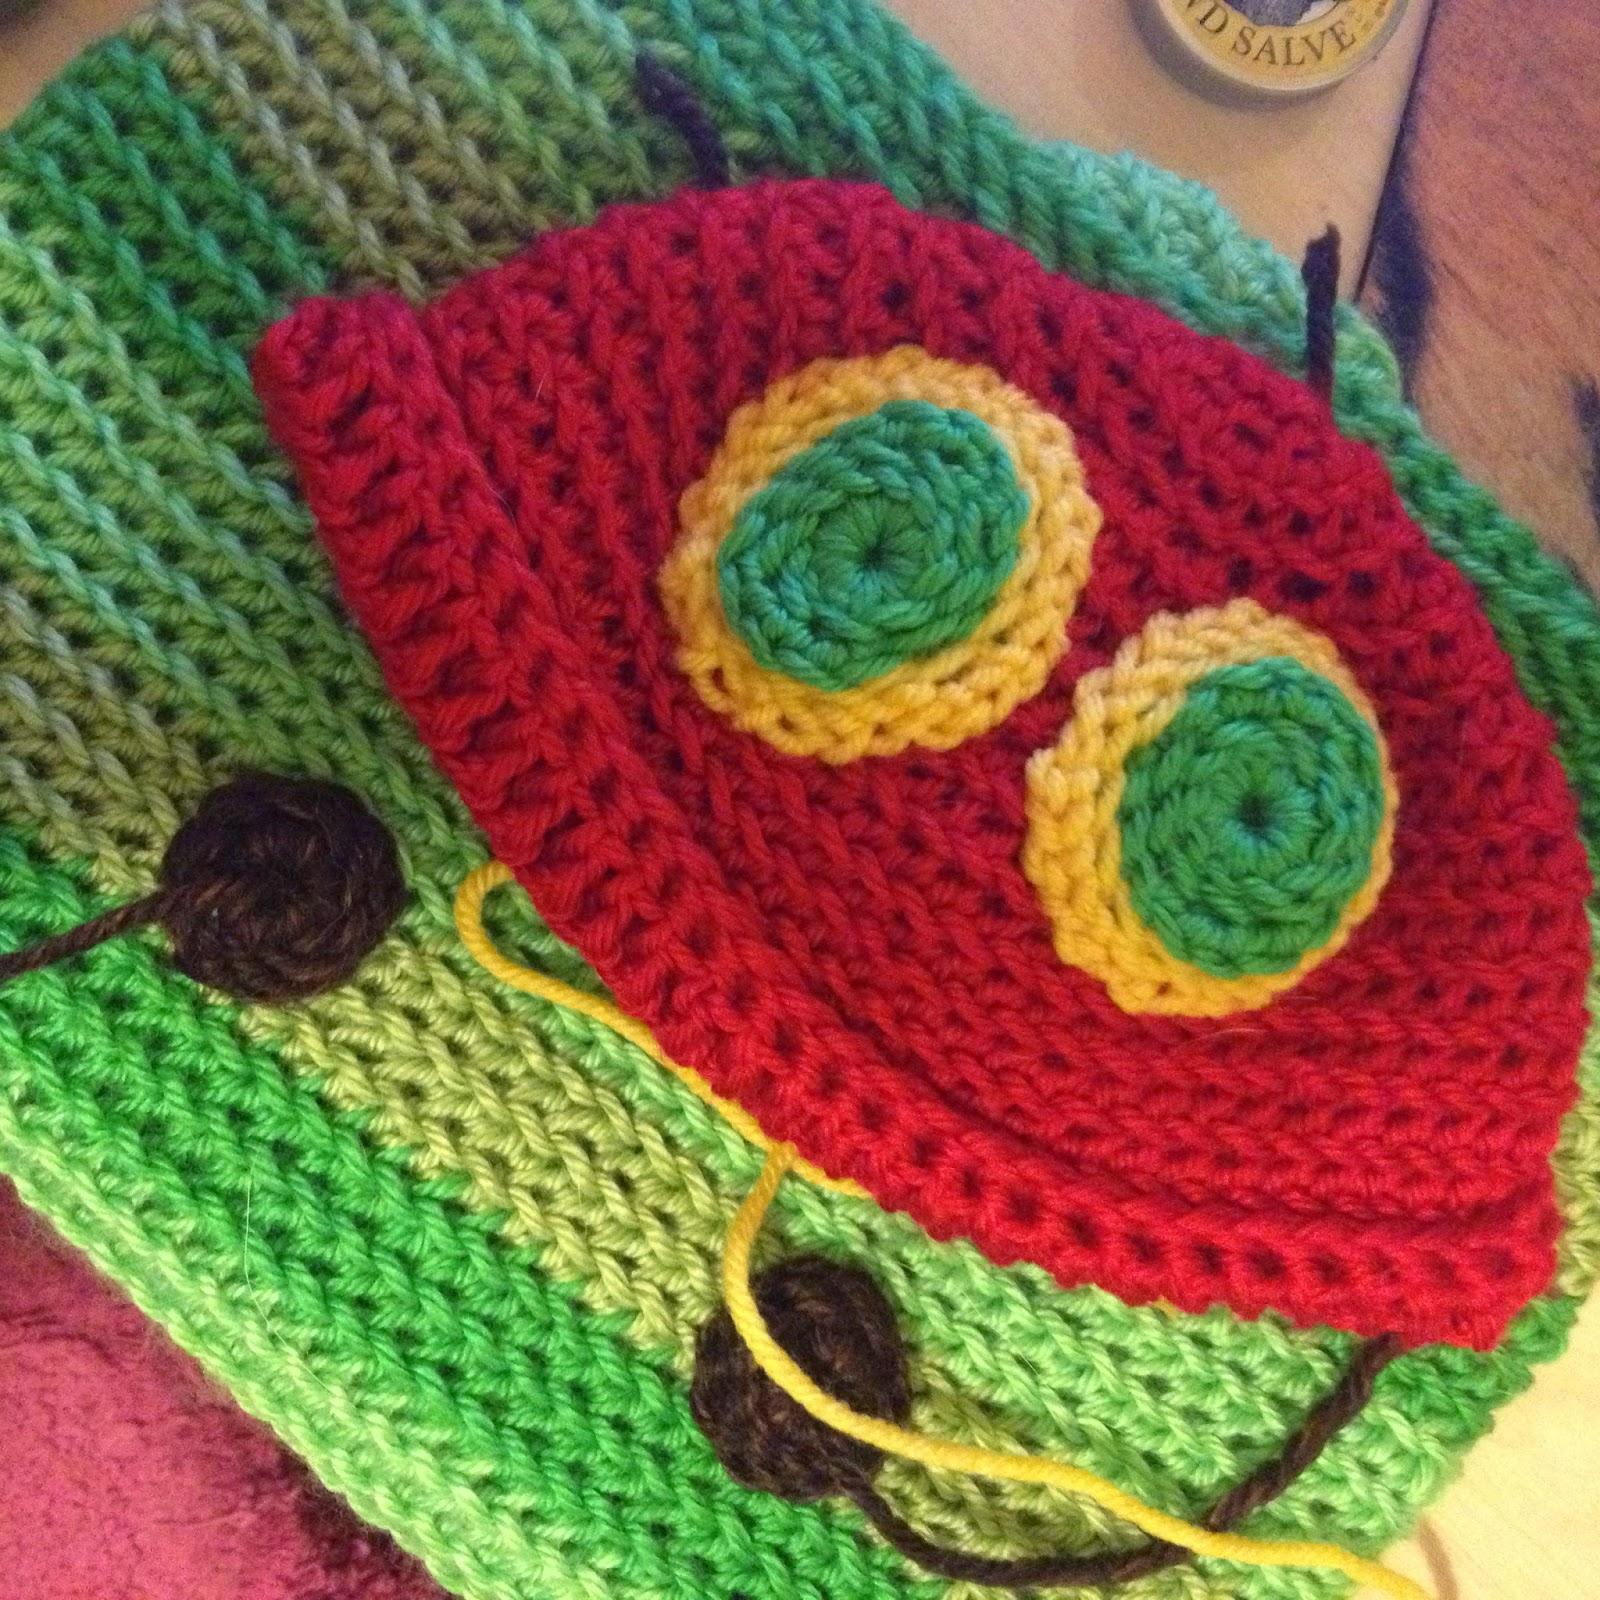 Knitting Pattern Very Hungry Caterpillar : WoollyRhinoCrafts: Very Hungry Caterpillar Crochet Baby Costume